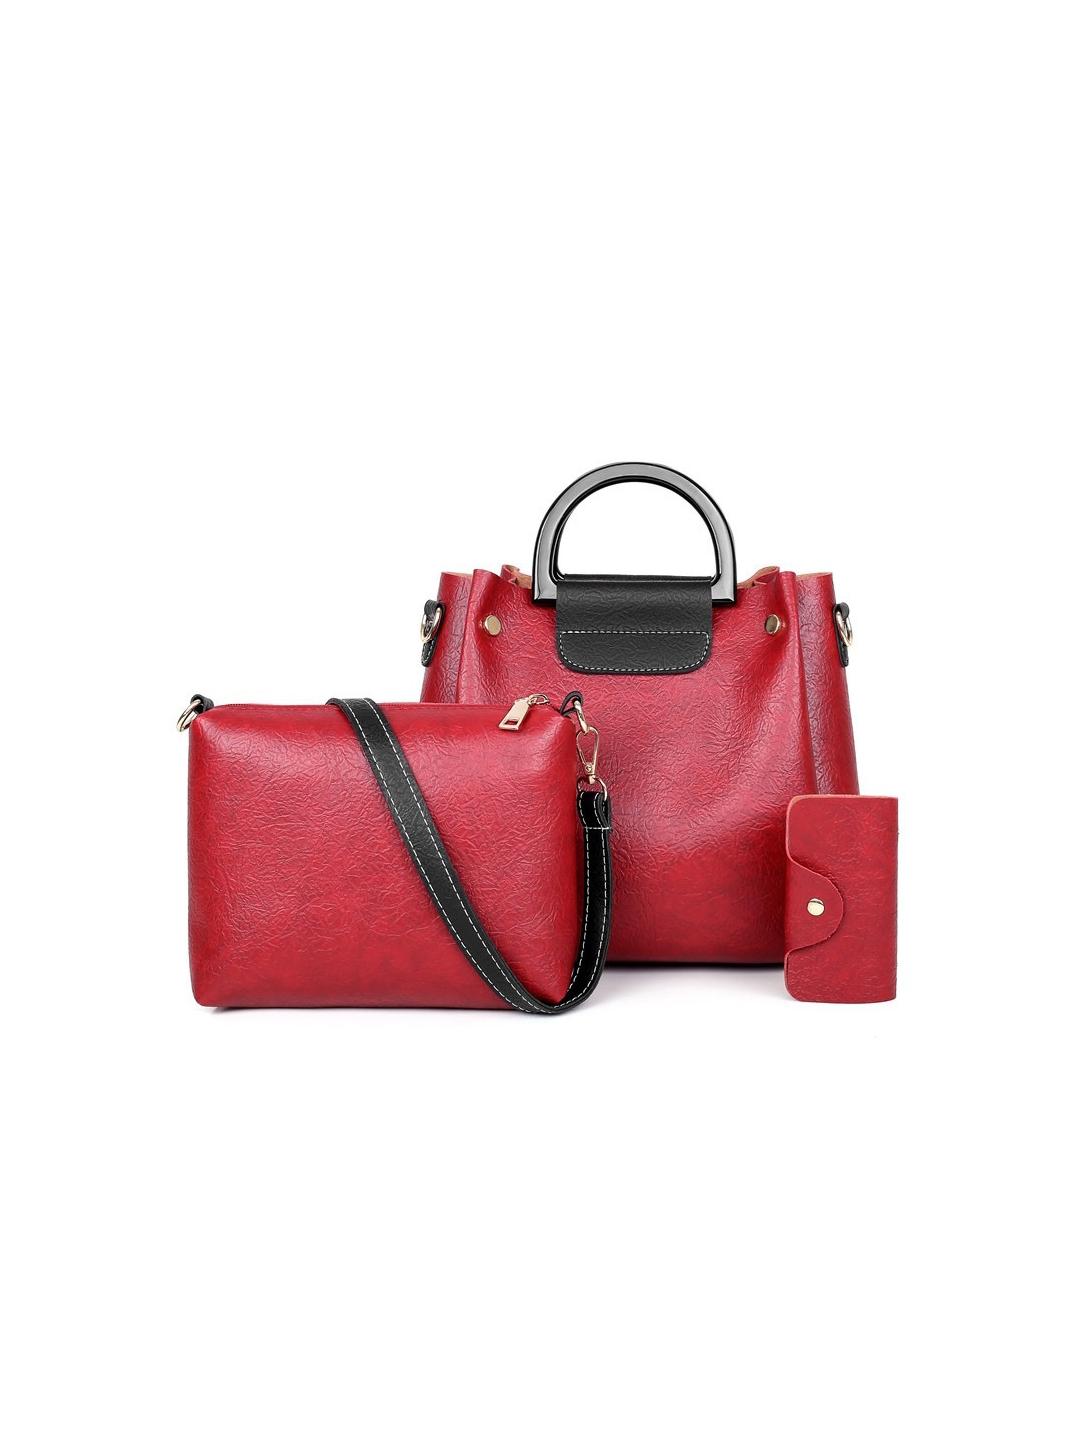 Contrast Color 3 Piece Handbag Sets For Women